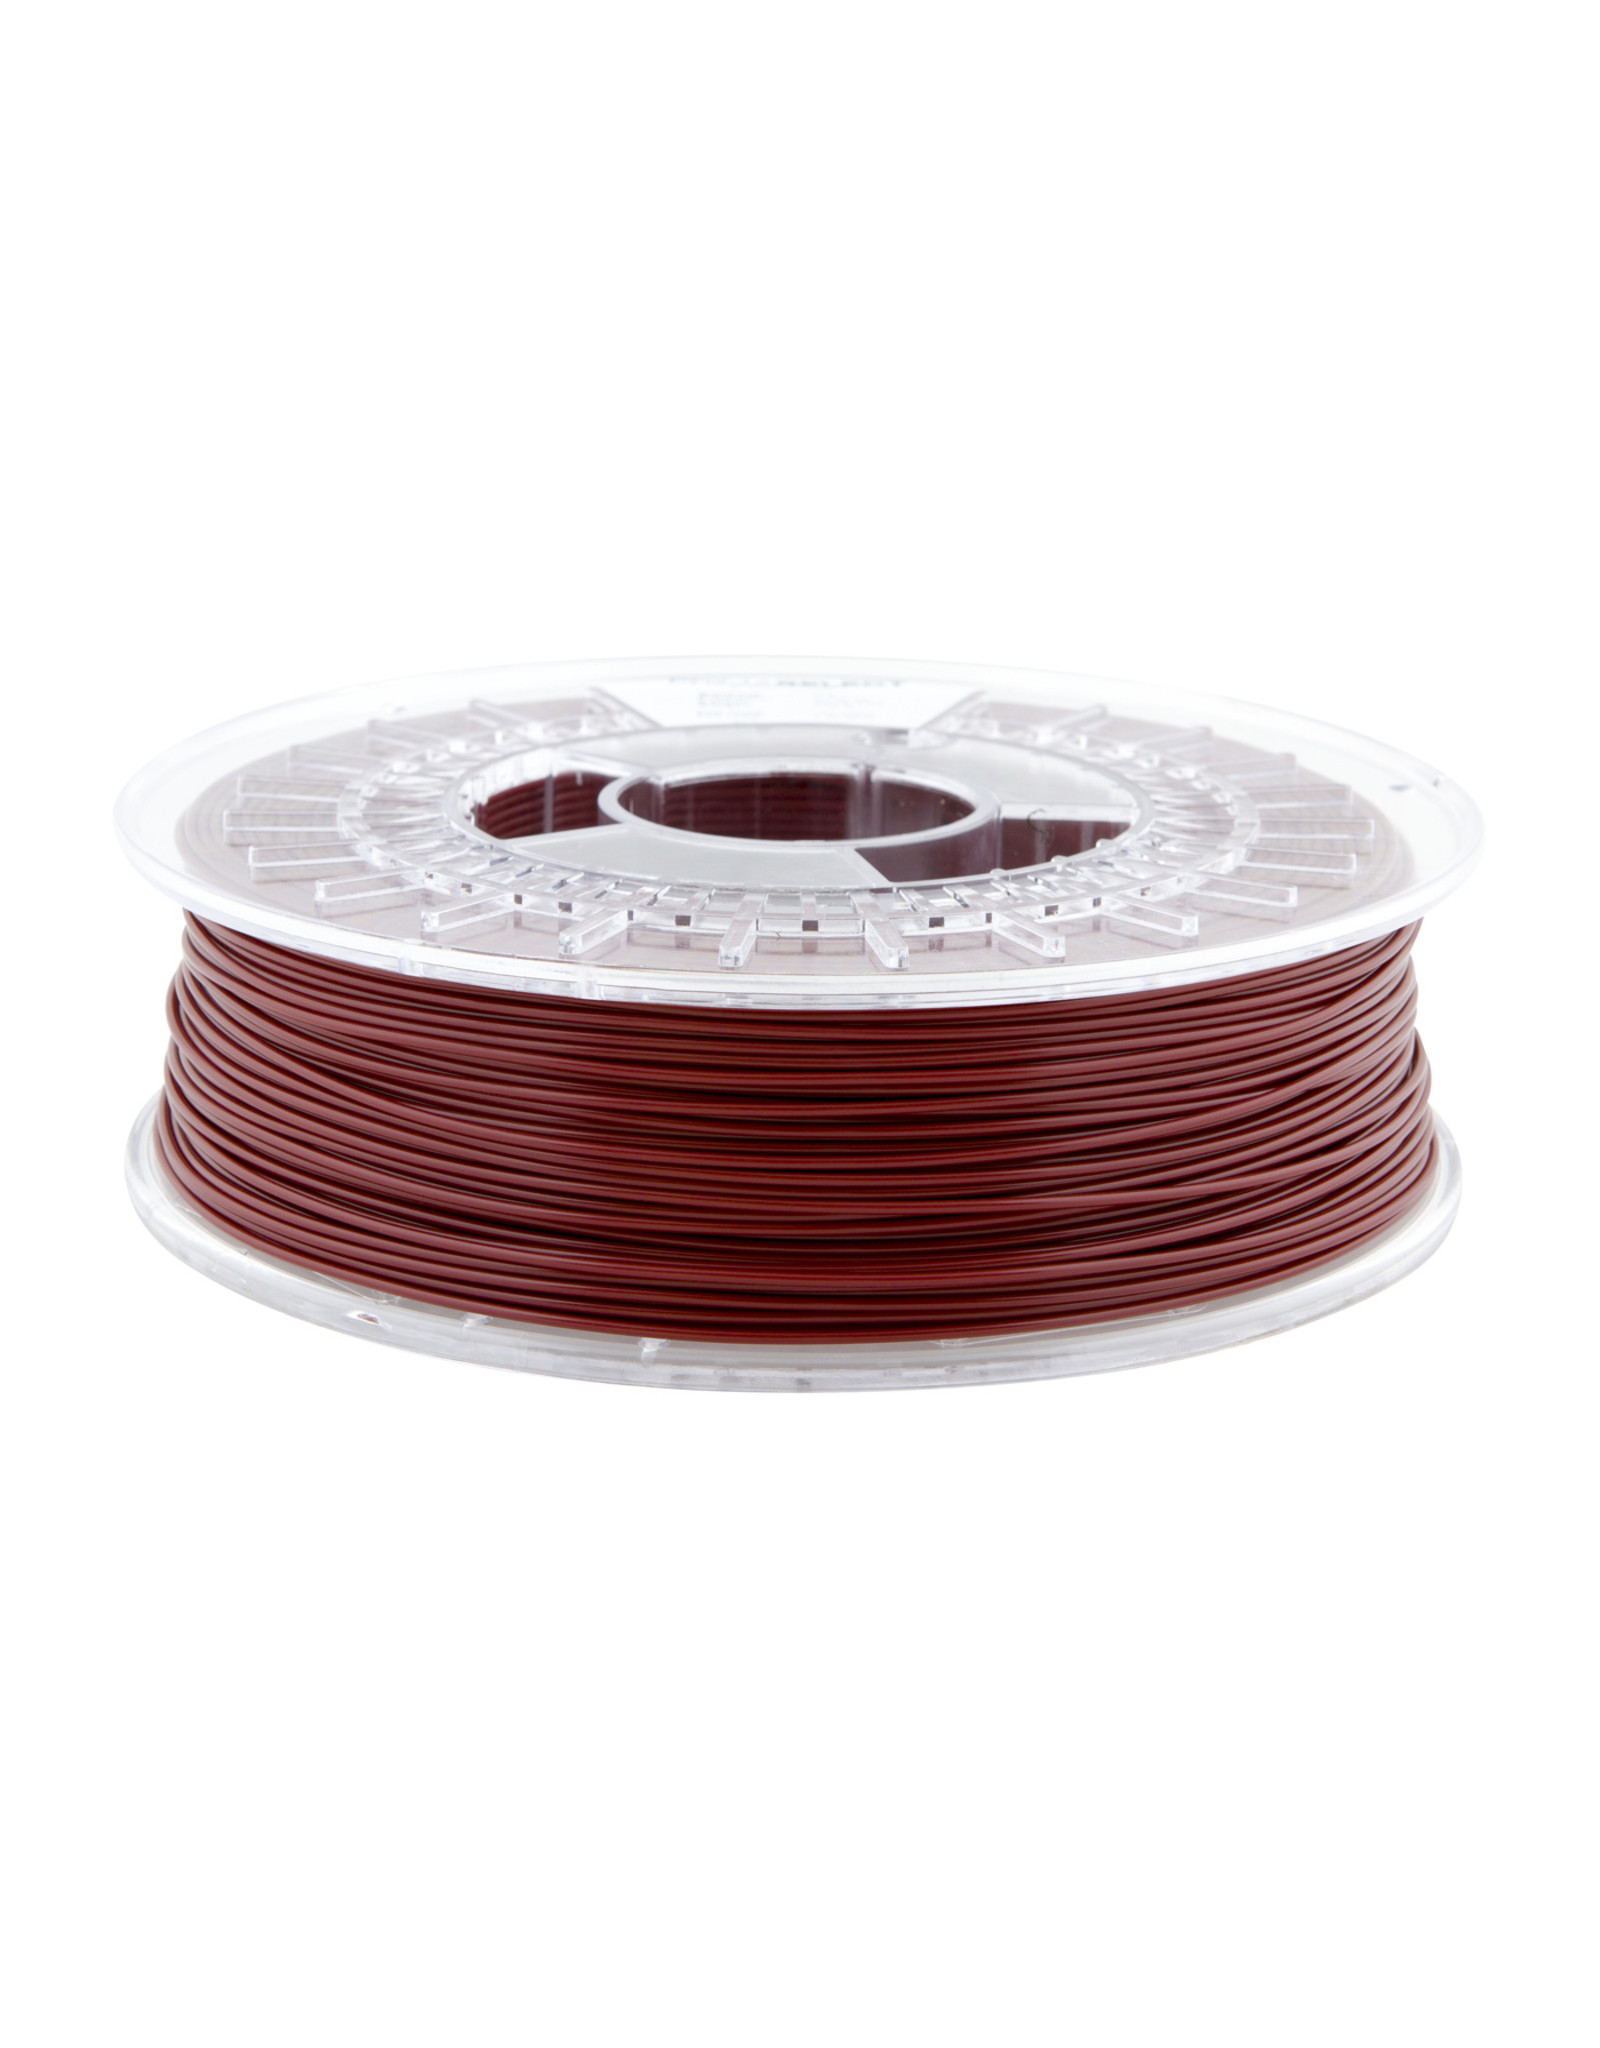 Prima PrimaSelect PLA 1.75mm - 750gr Wine Red